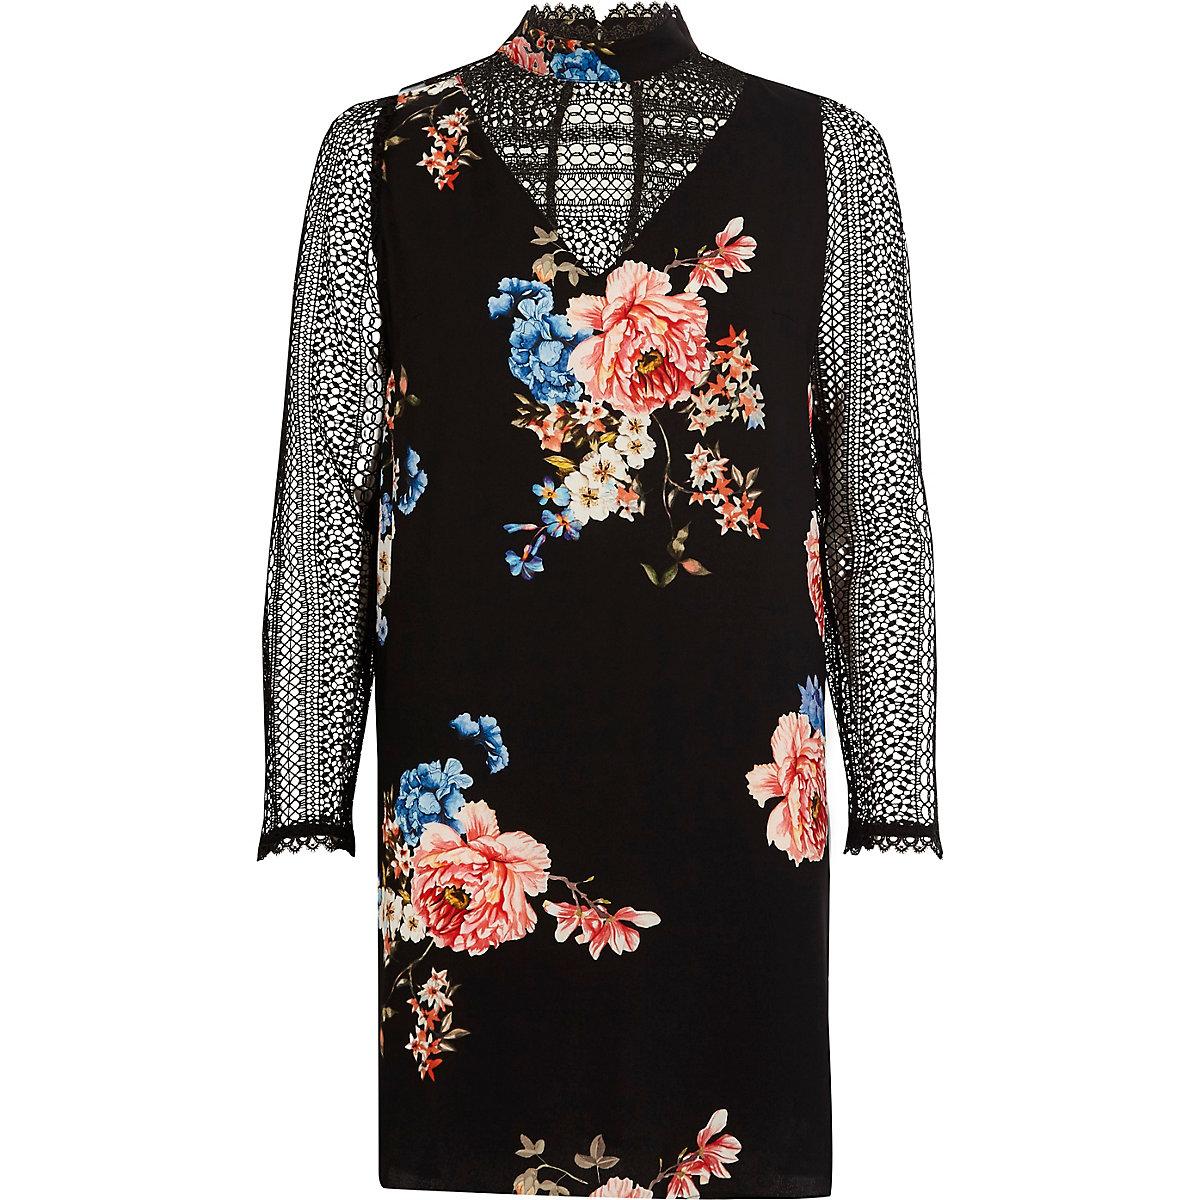 Black floral print lace insert swing dress